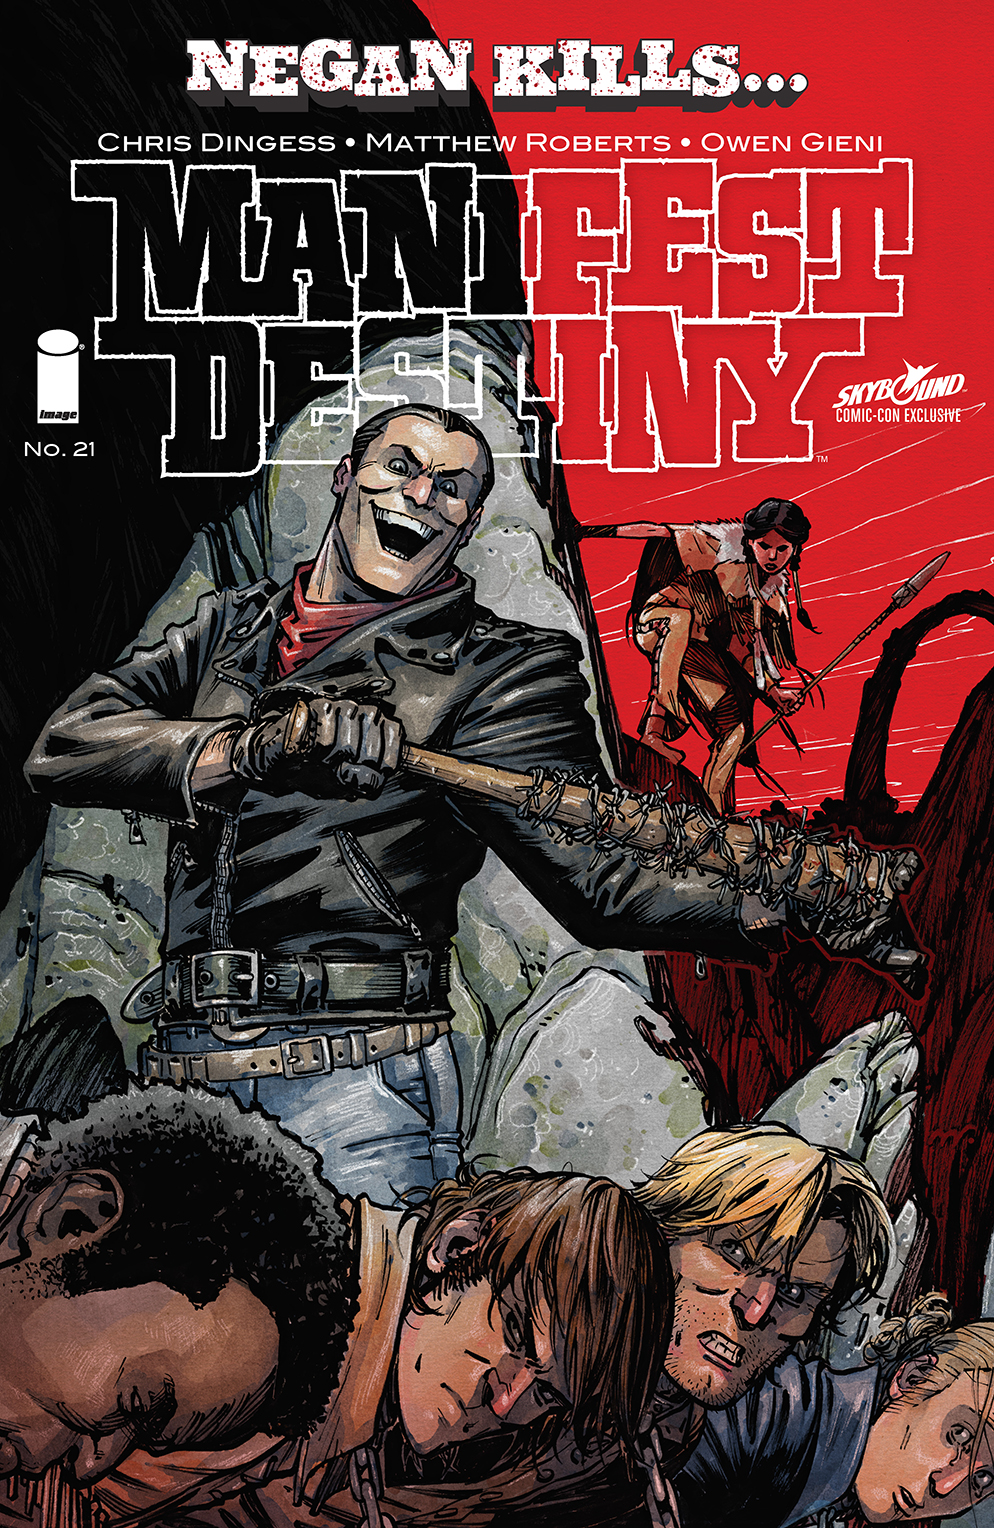 Cover Comic Book Thief of Thieves #33 Skybound Comic-Con Negan Kills..